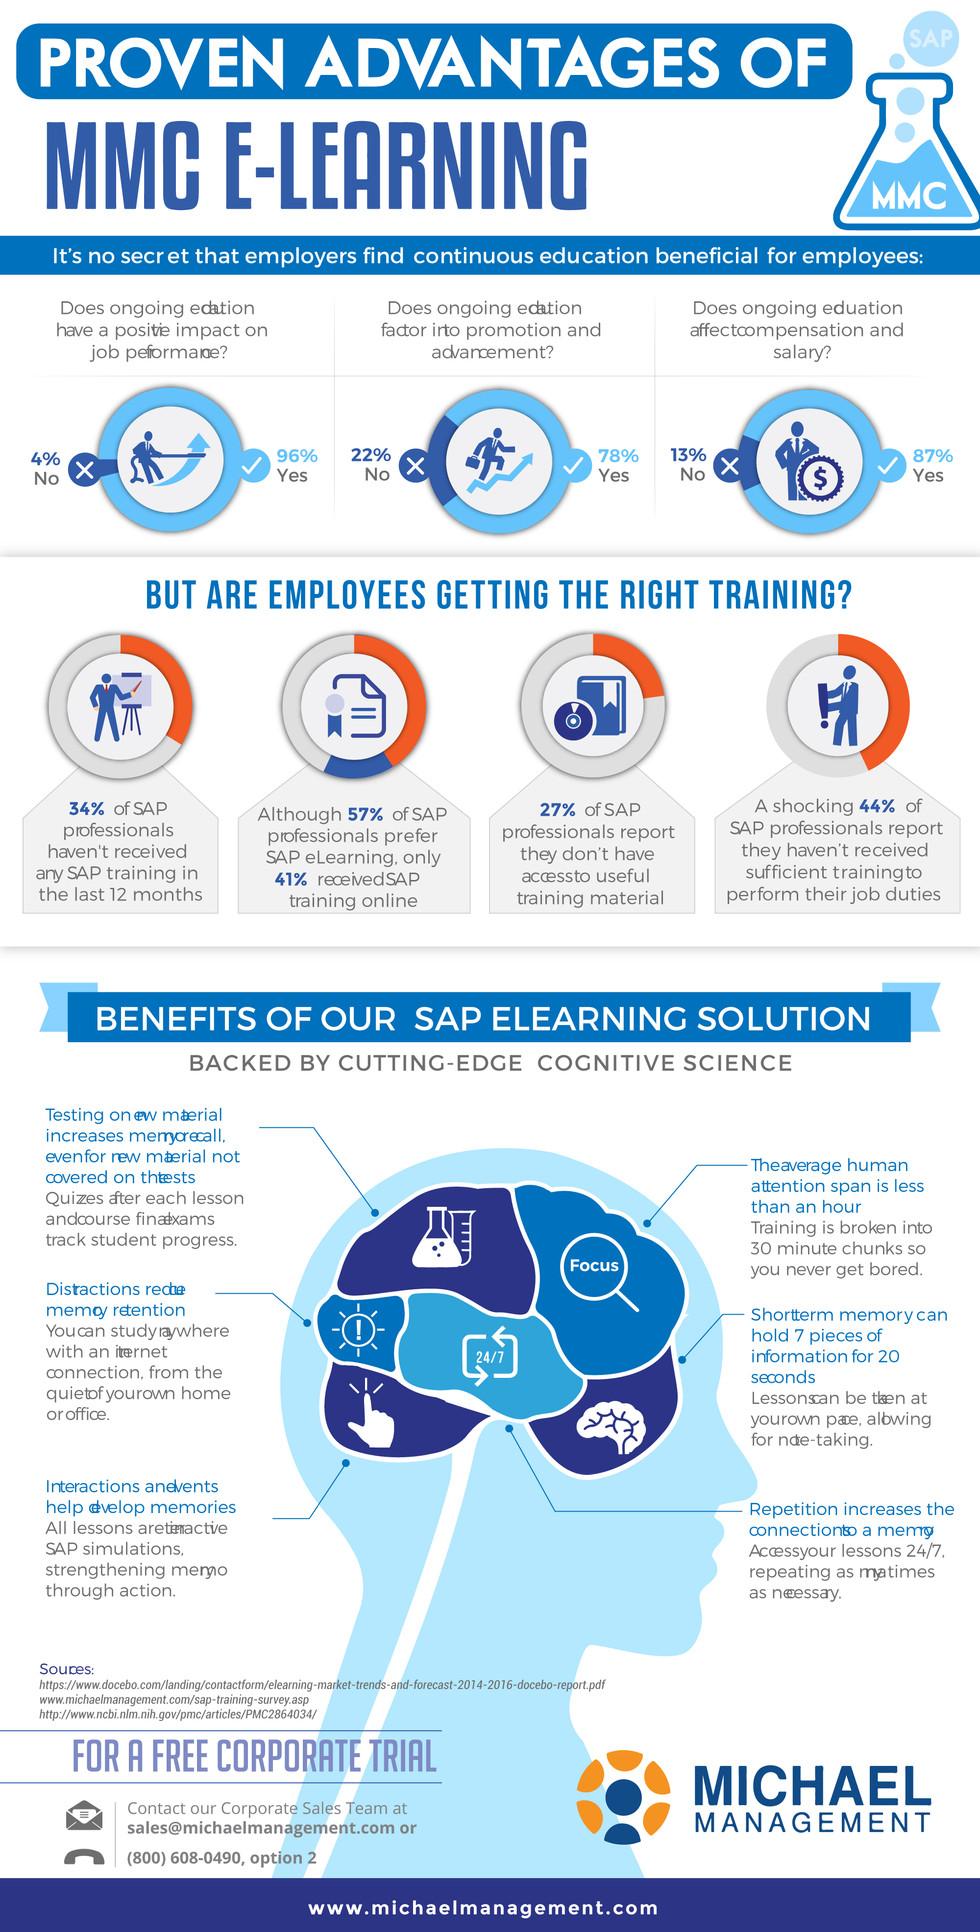 Proven Advantage of MMC E-Learning